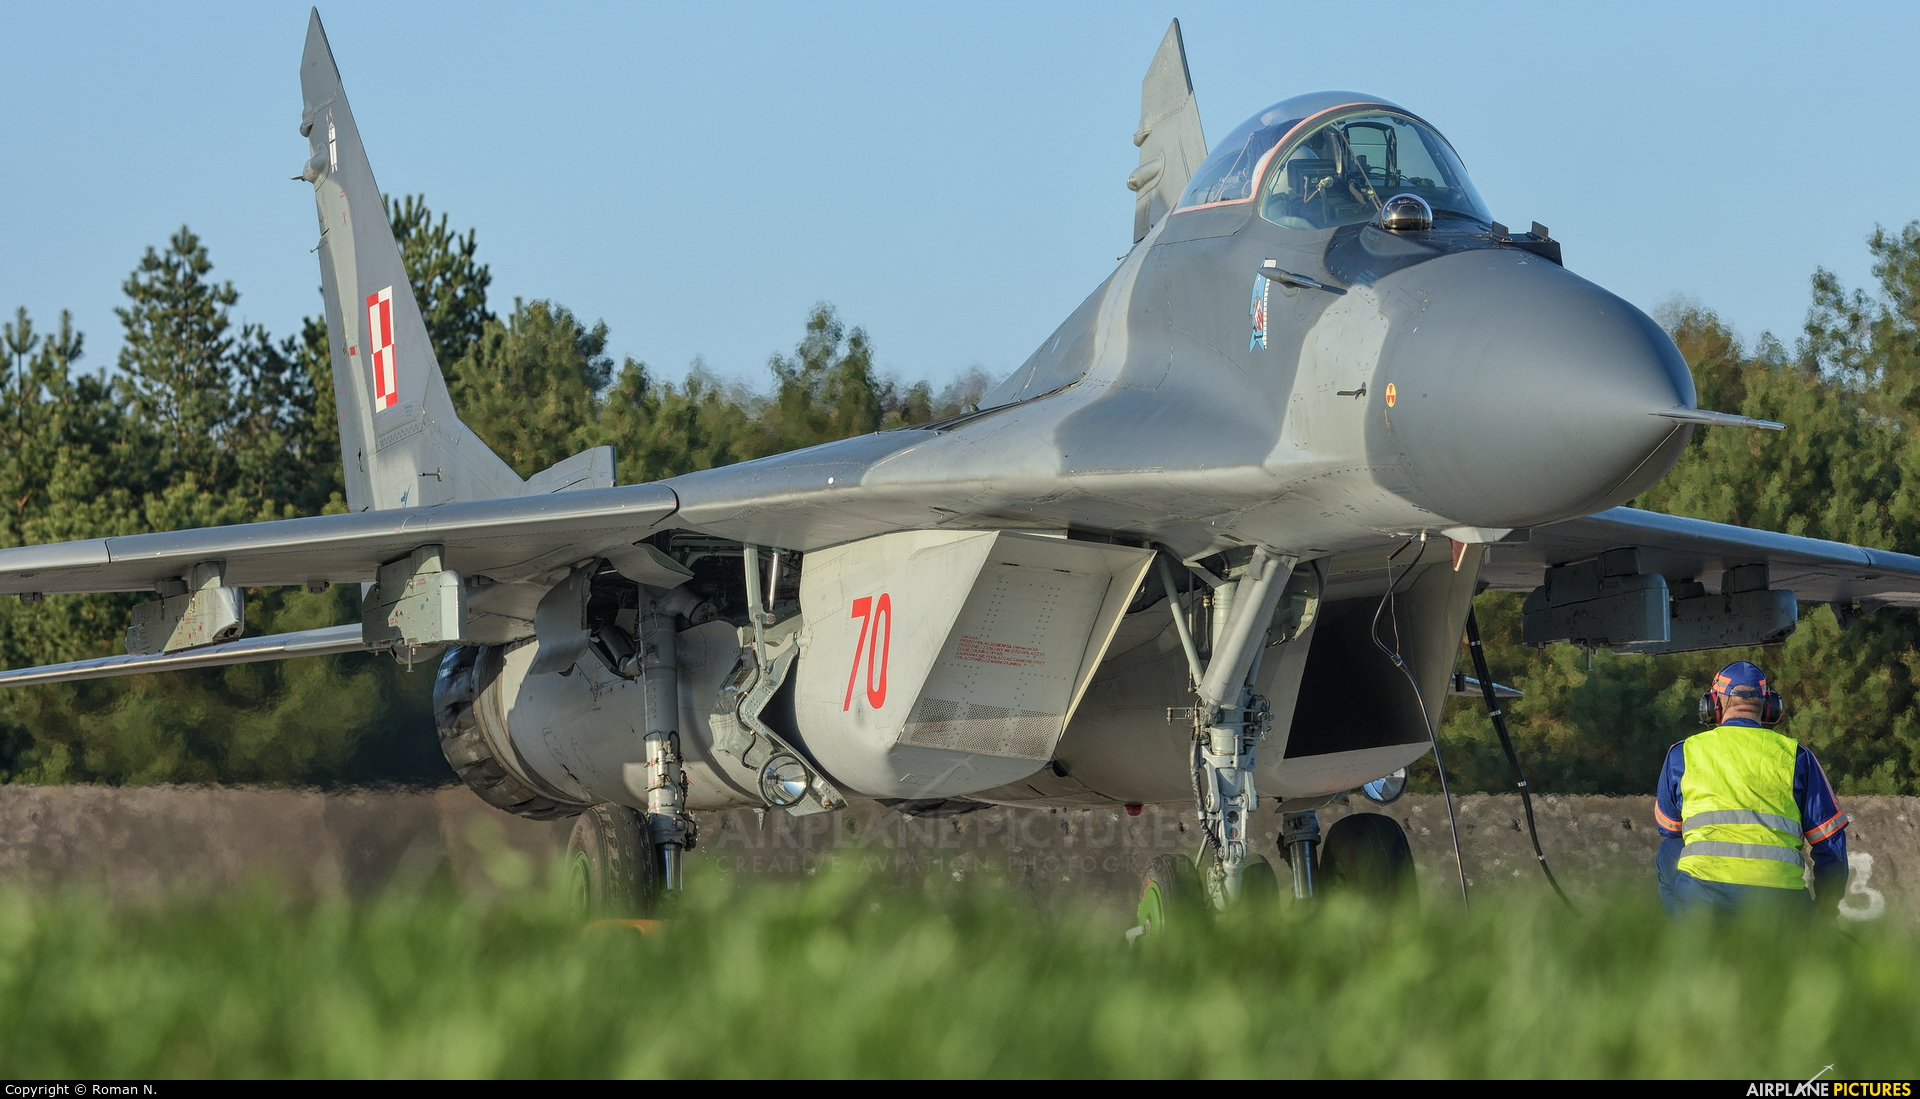 Poland - Air Force 70 aircraft at Świdwin